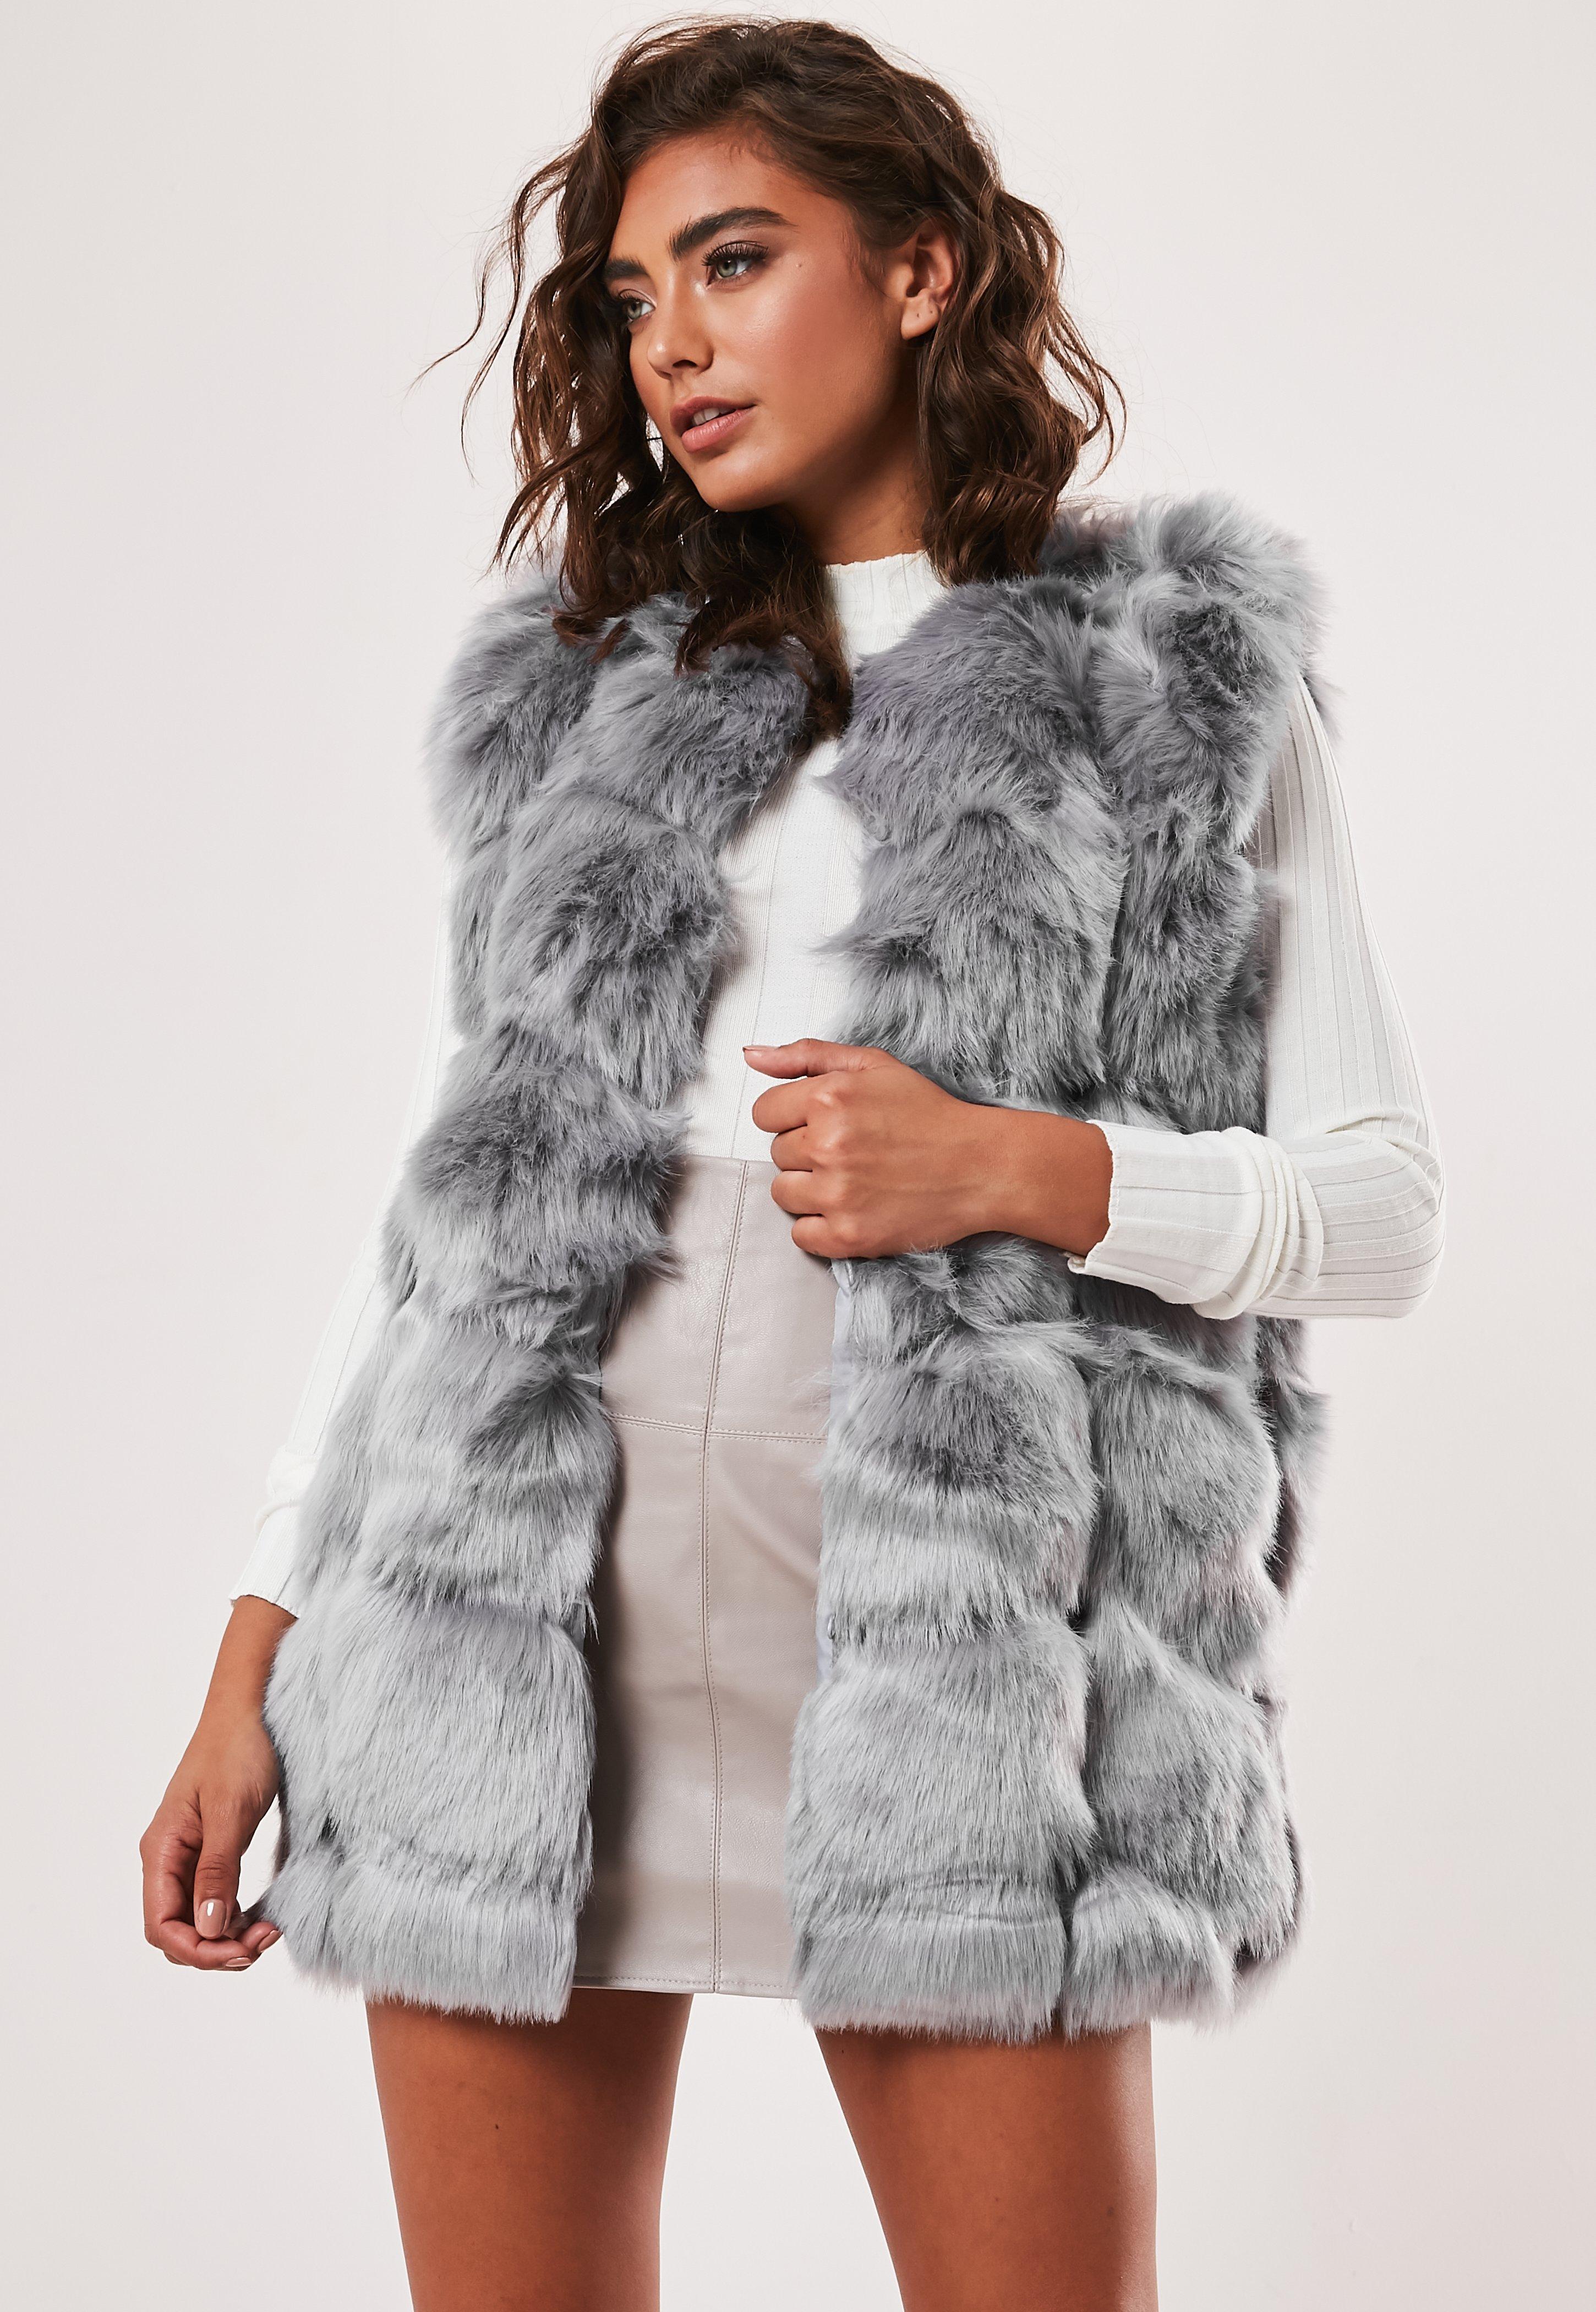 80dade1f8 Grey Faux Fur Bubble Gilet